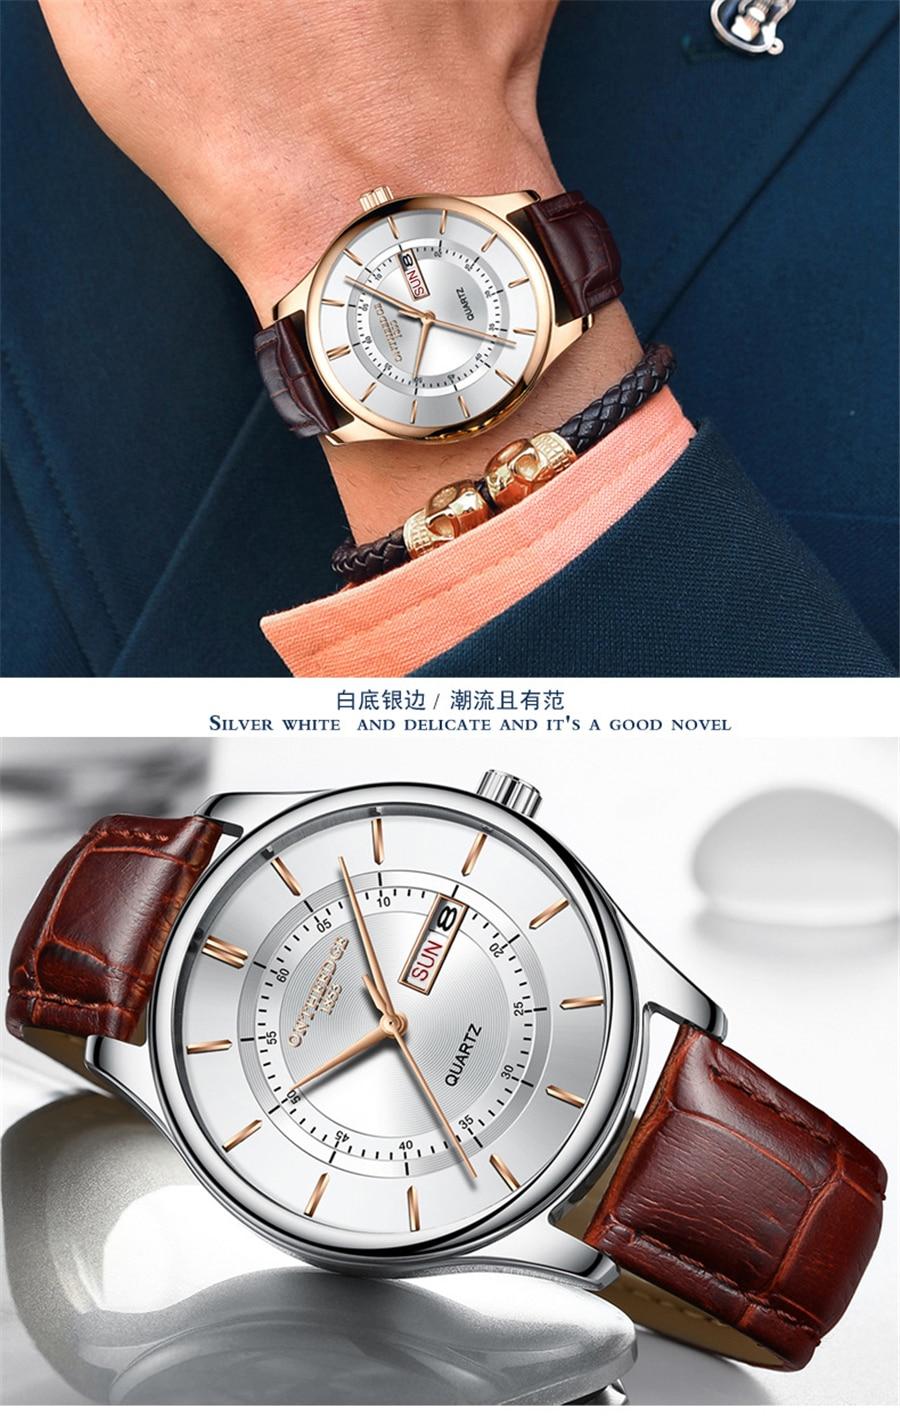 HTB1NTlfcwKTBuNkSne1q6yJoXXa7 High Quality Rose Gold Dial Watch Men Leather Waterproof 30M Watches Business Fashion Japan Quartz Movement Auto Date Male Clock